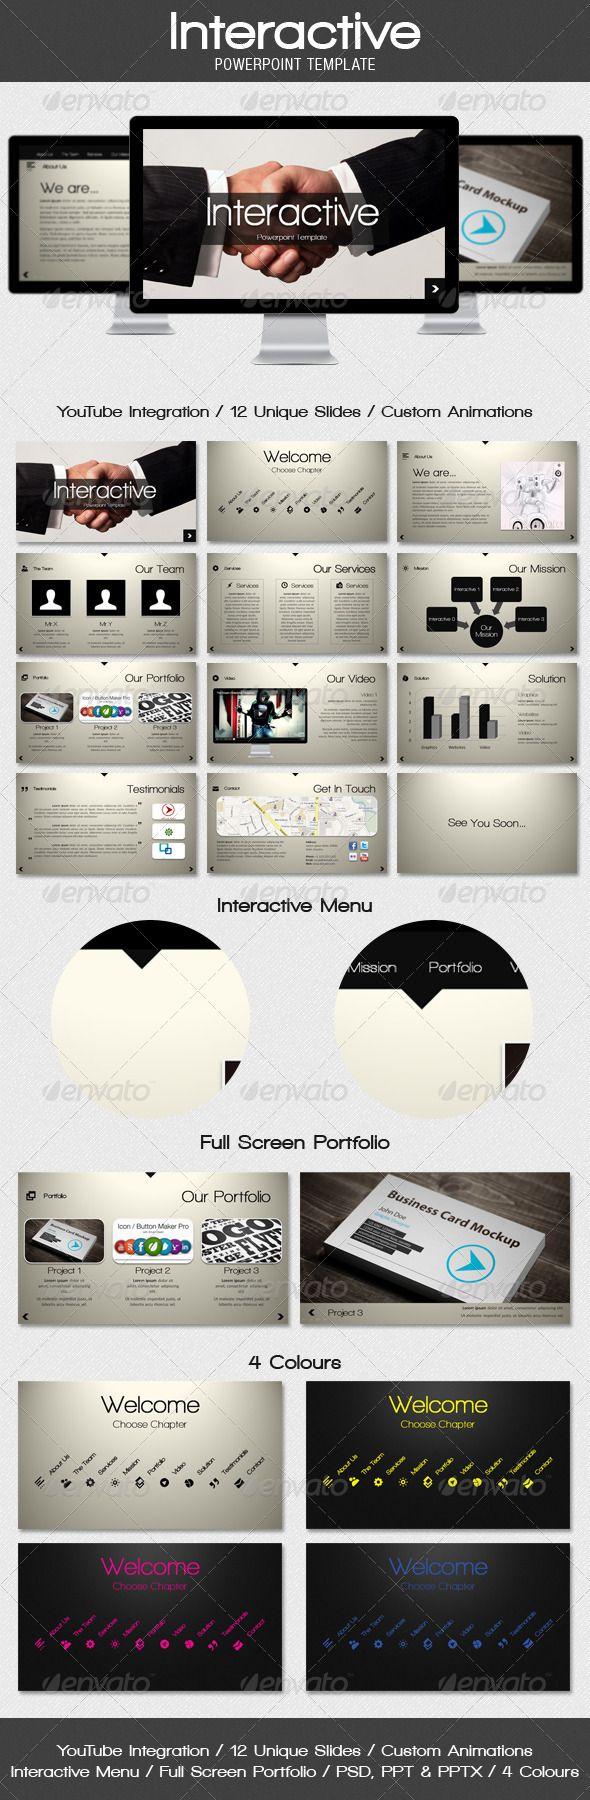 interactive powerpoint presentation